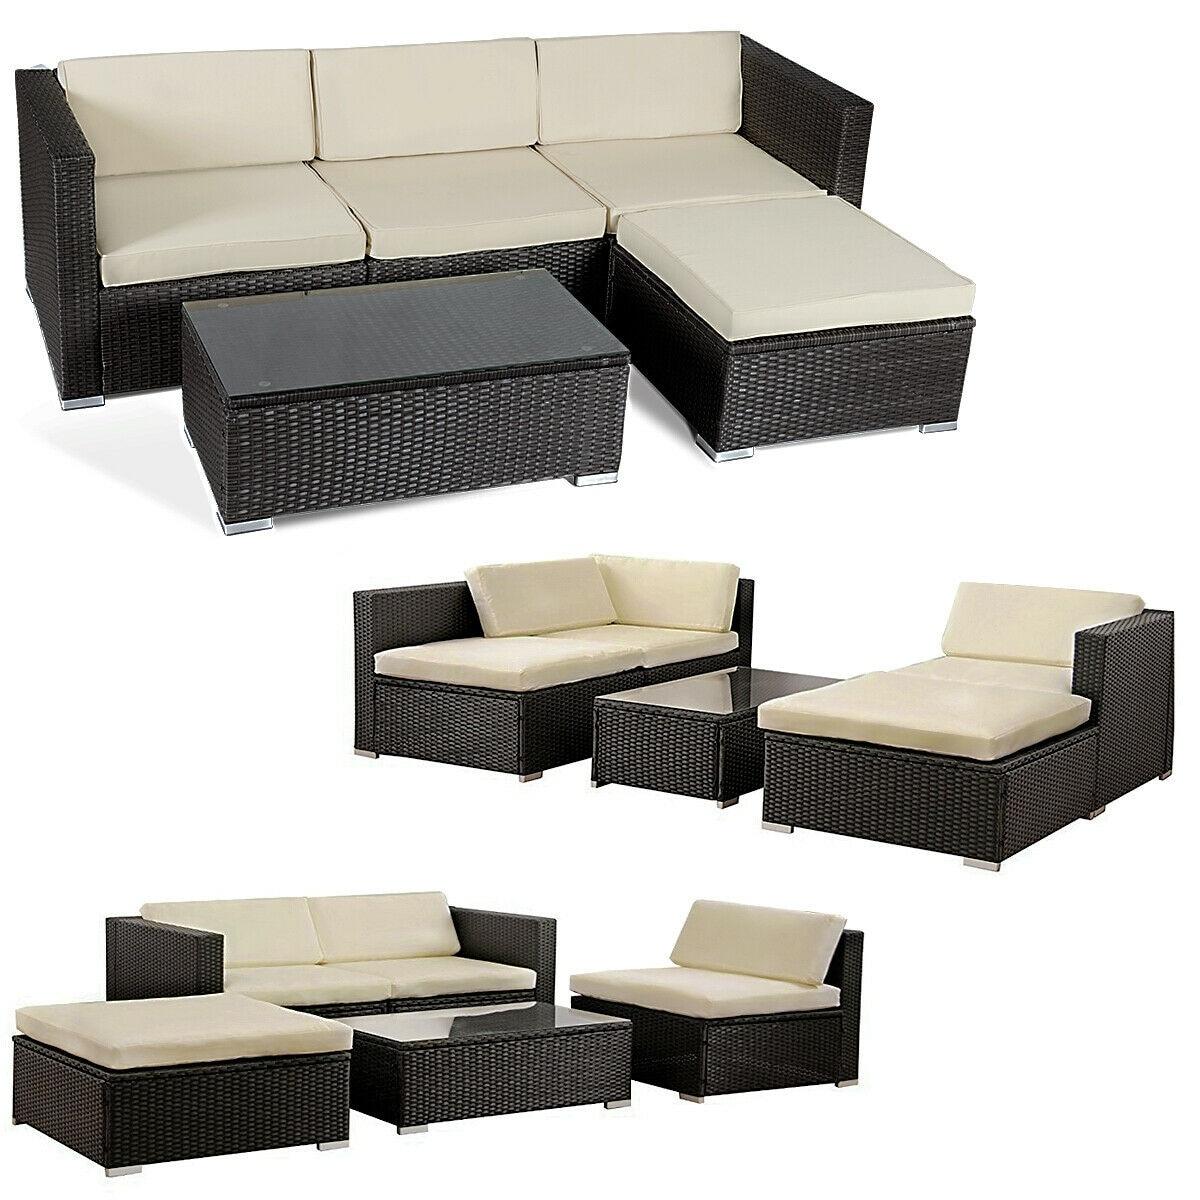 d360be74b580 Shop Costway 5 PCS Patio Furniture Set Rattan Wicker Table Shelf Garden Sofa  W/ Cushion Brown - Free Shipping Today - Overstock - 18531901